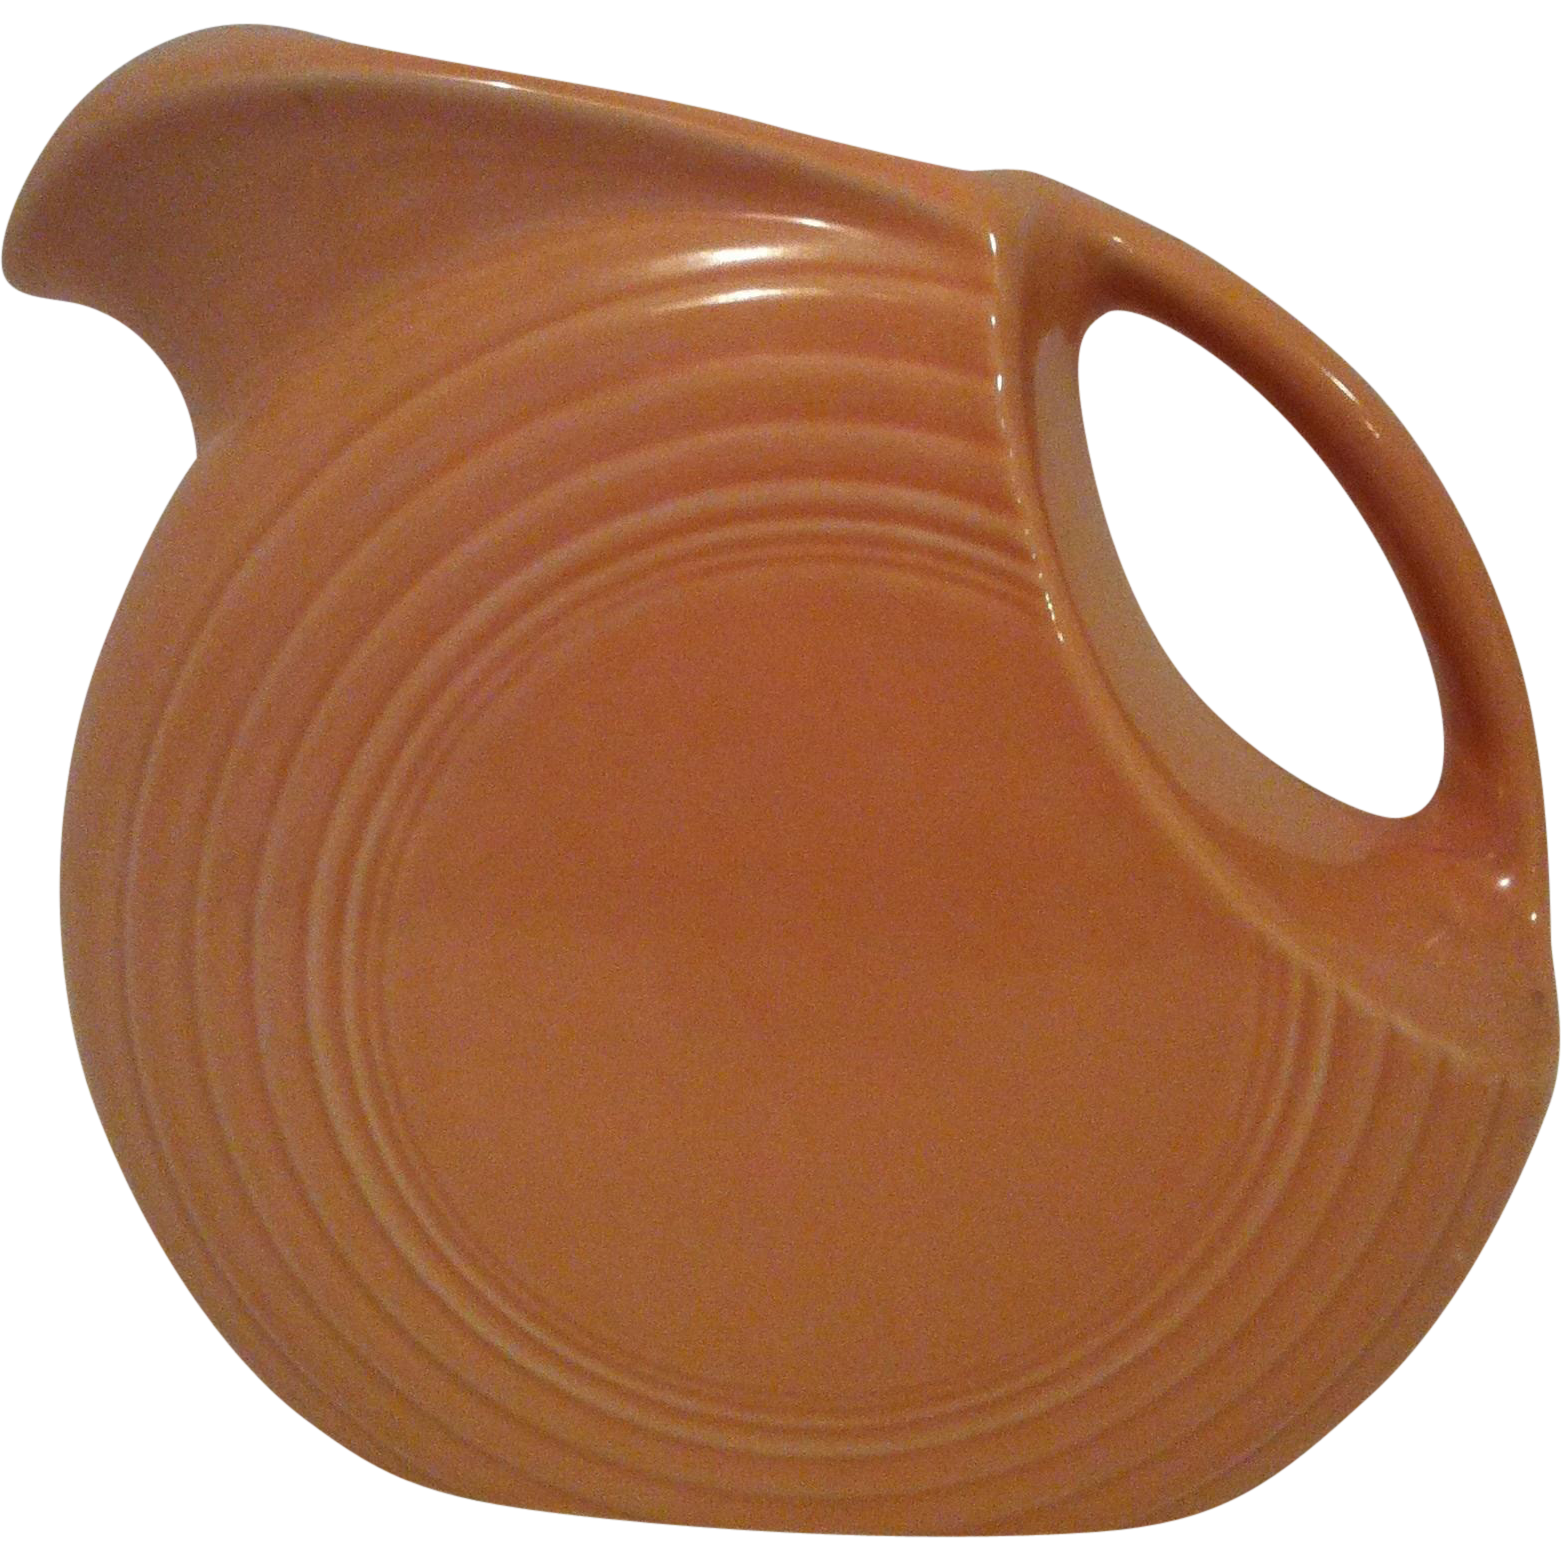 Apricot Fiesta Disk Pitcher